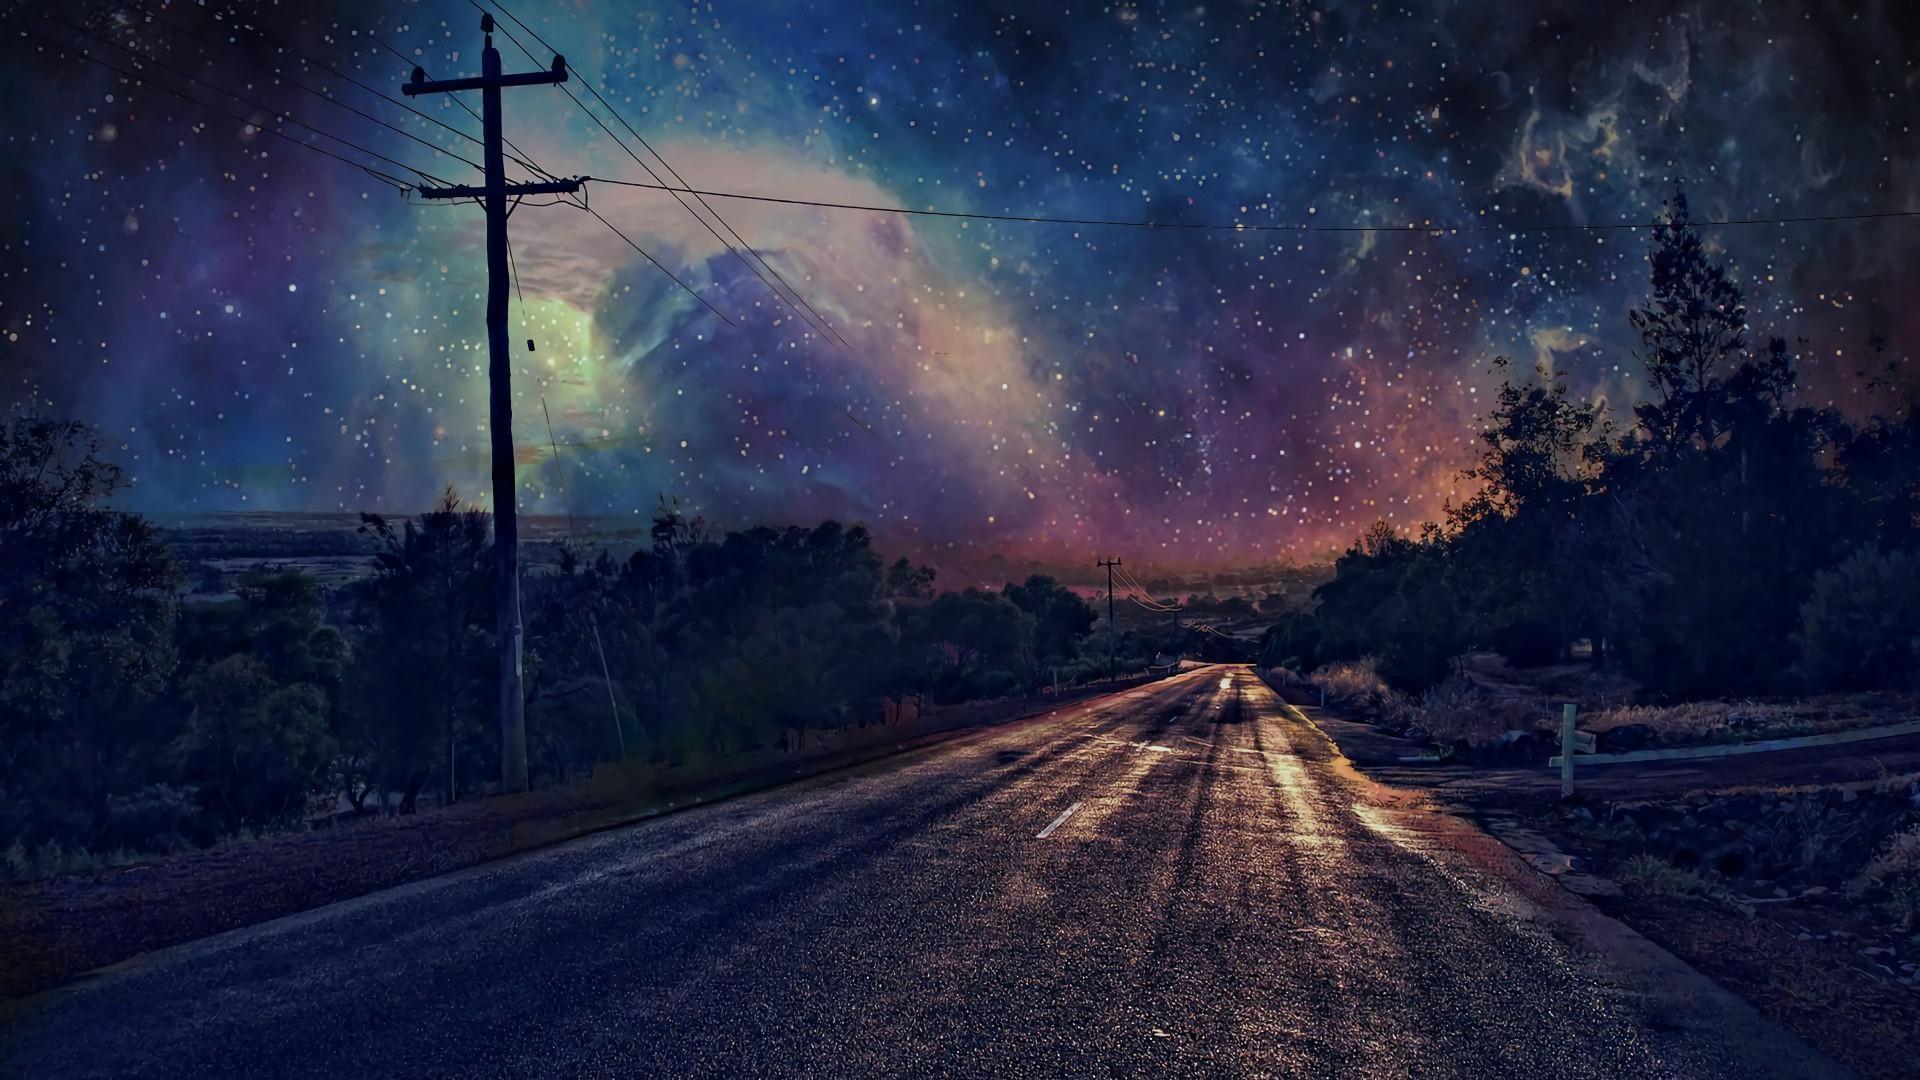 Man Made – Road Starry Sky Sky Night Wallpaper